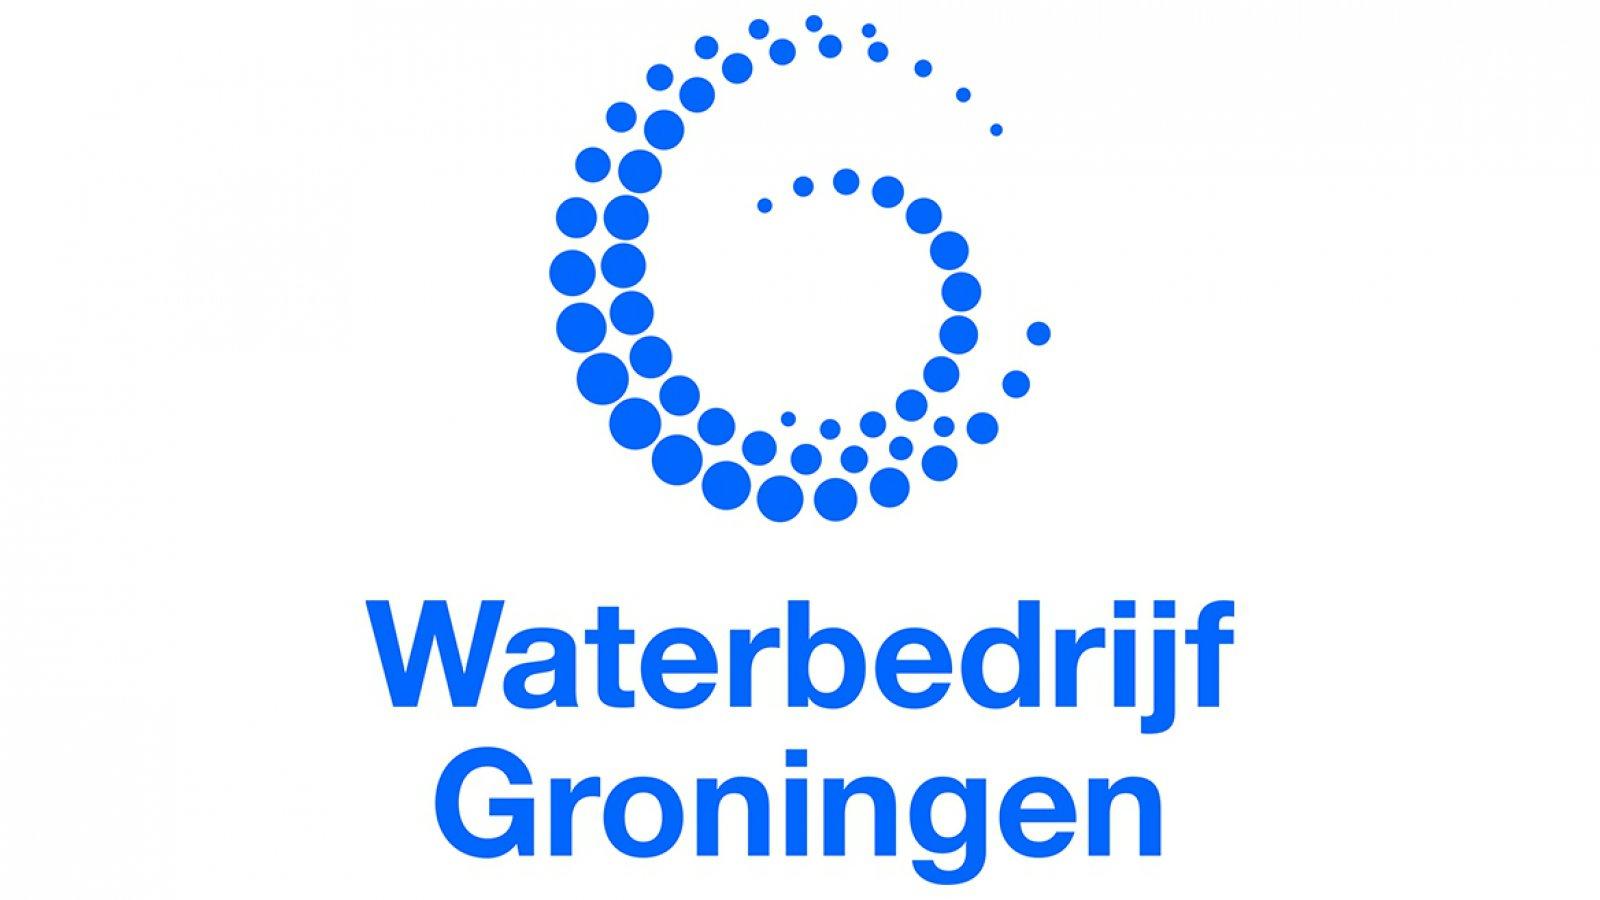 https://www.waterforlife.nl/files/visuals/_1600x900_fit_center-center_85_none/logo-website_200514_135248.jpg